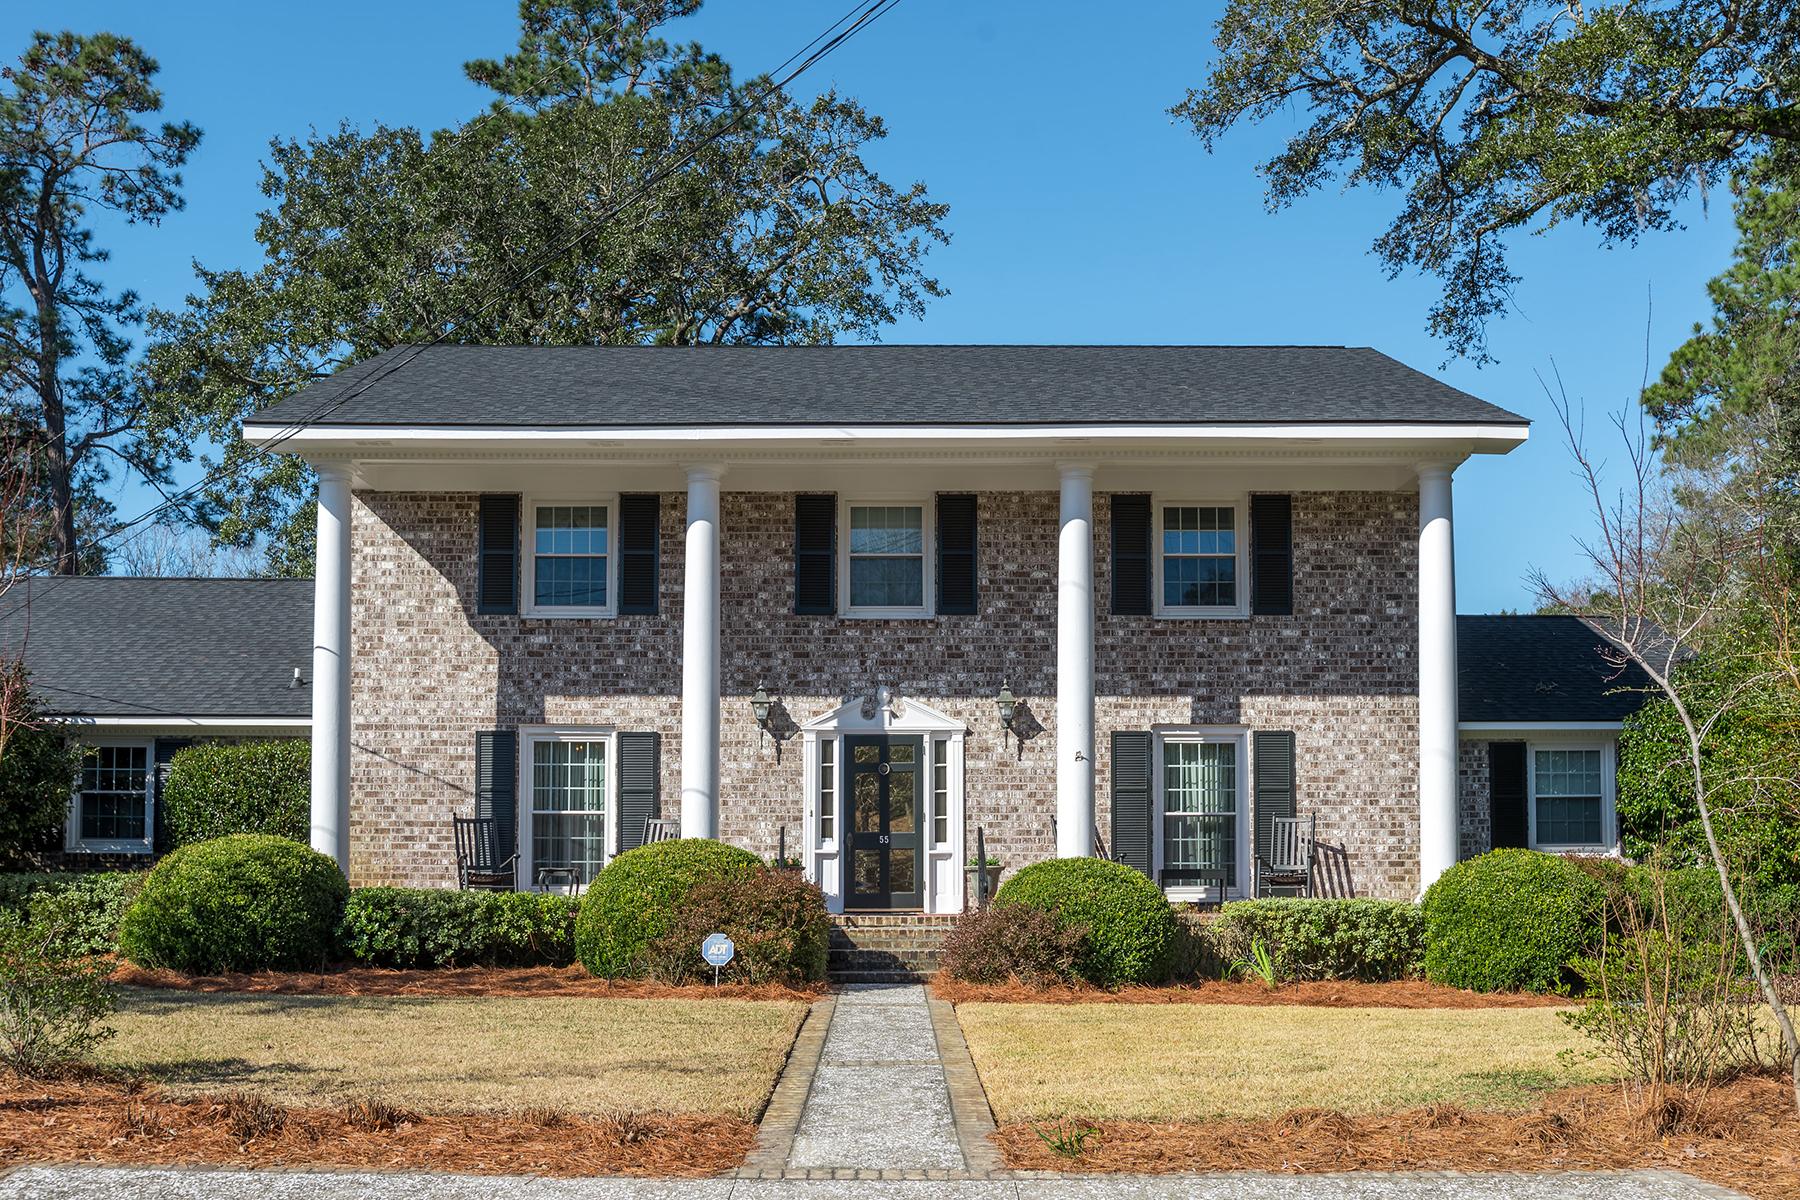 Single Family Home for Sale at 55 Shrewsbury Road Charleston, South Carolina, 29407 United States